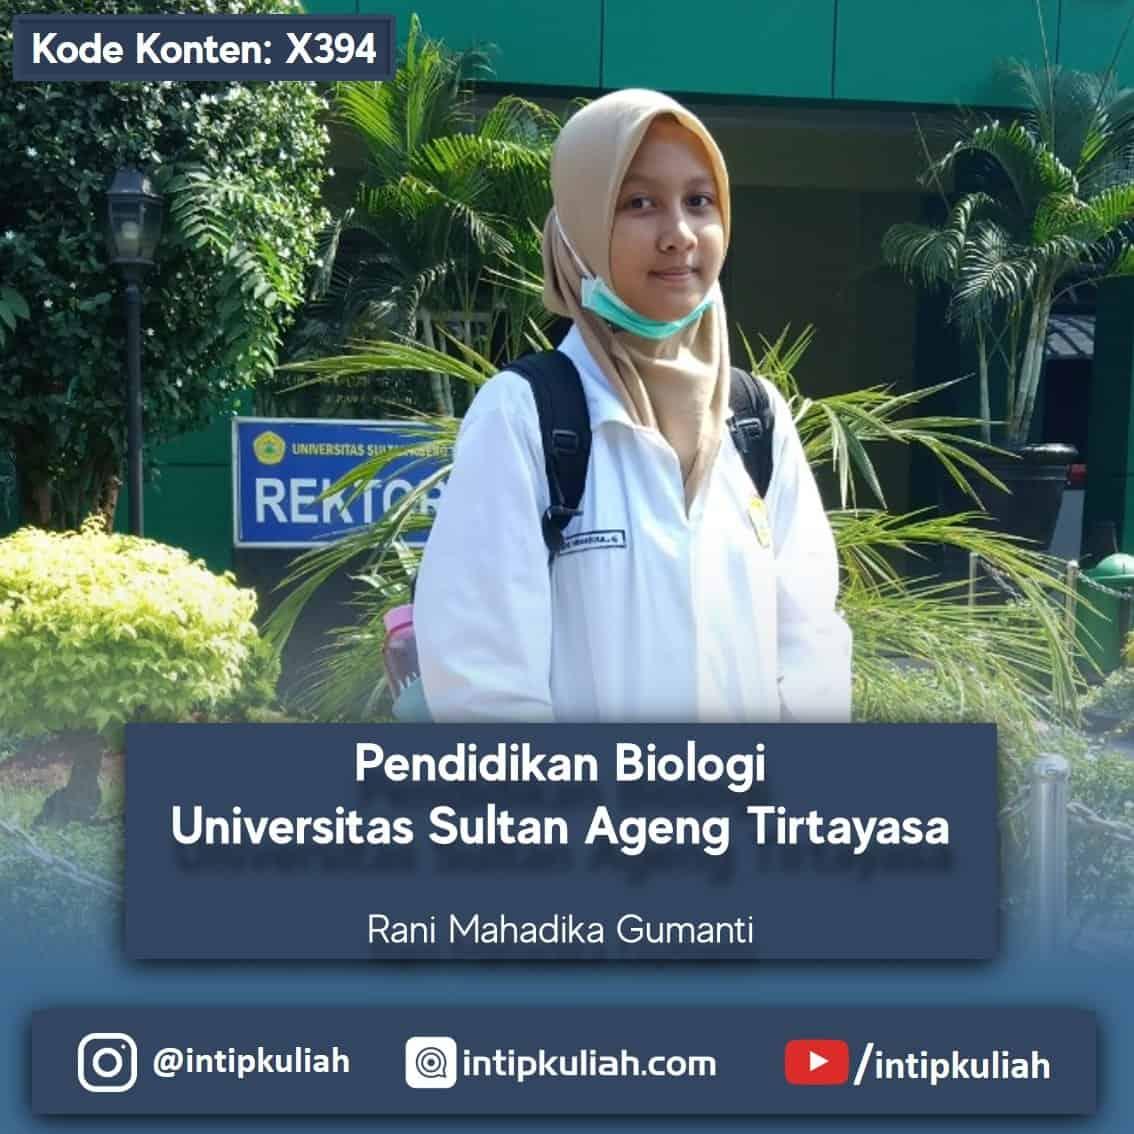 Pendidikan Biologi Untirta (Rani)